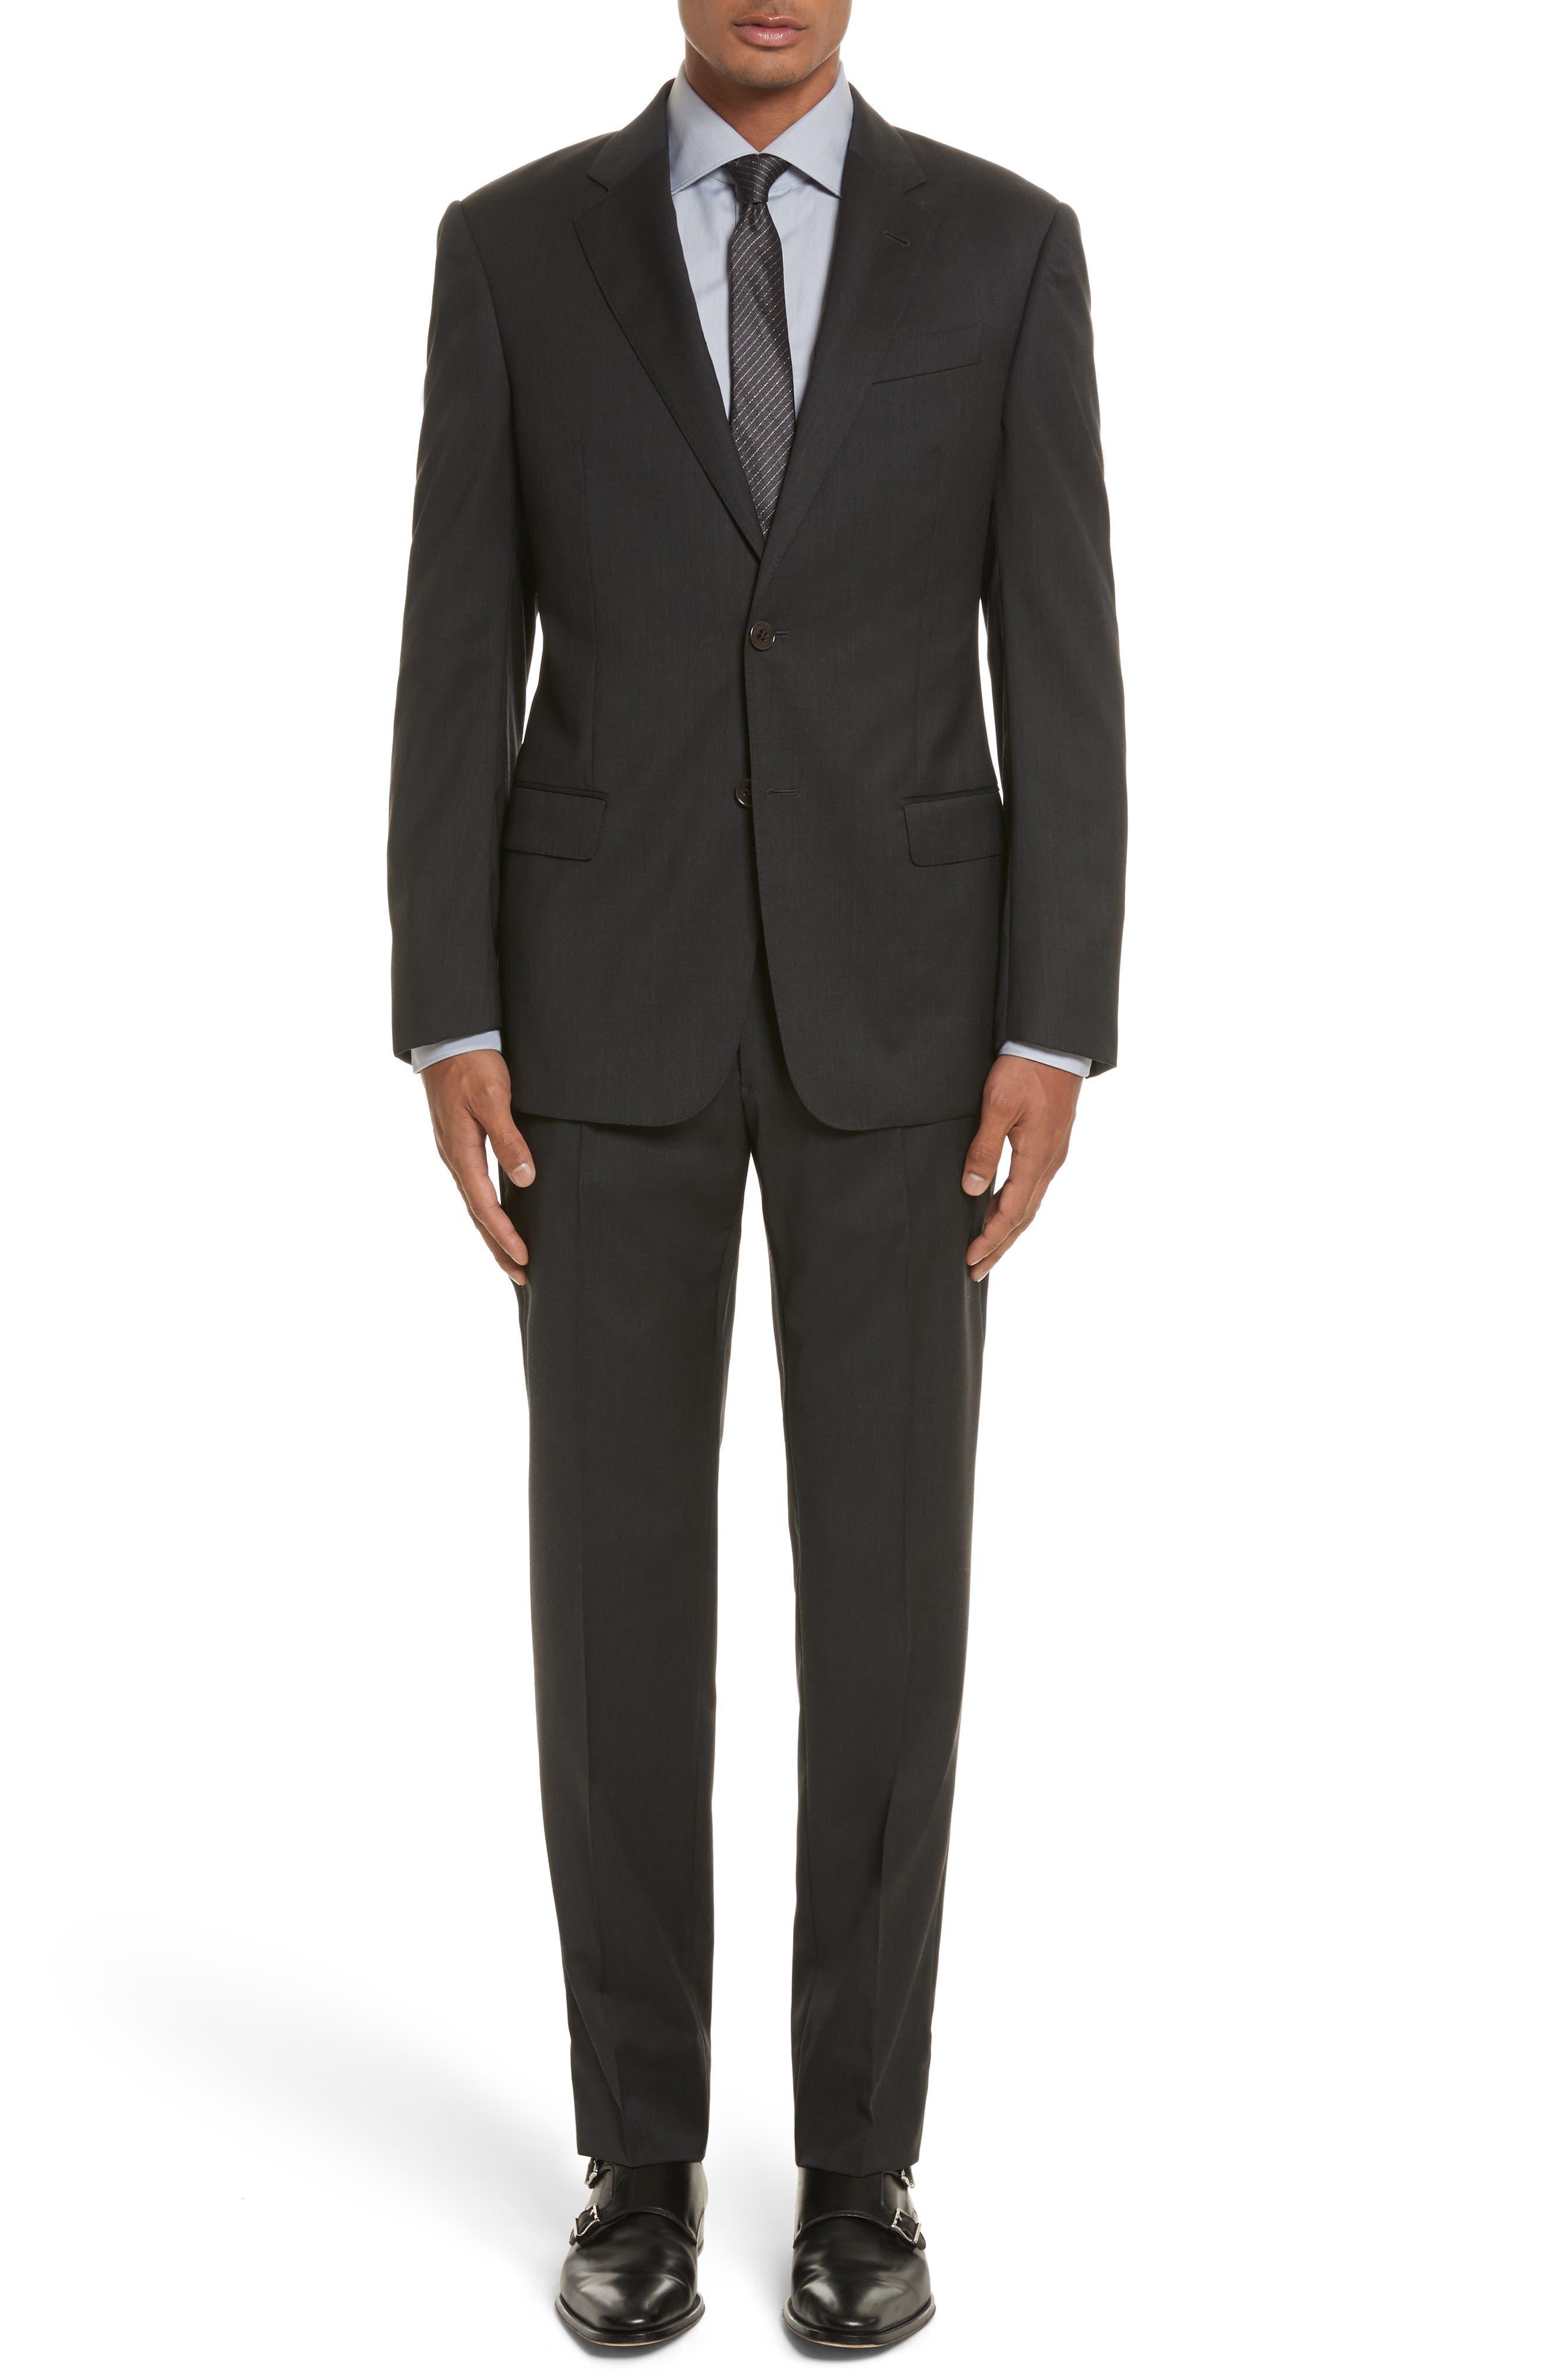 'G-Line' Trim Fit Solid Wool Suit,                             Main thumbnail 1, color,                             Charcoal